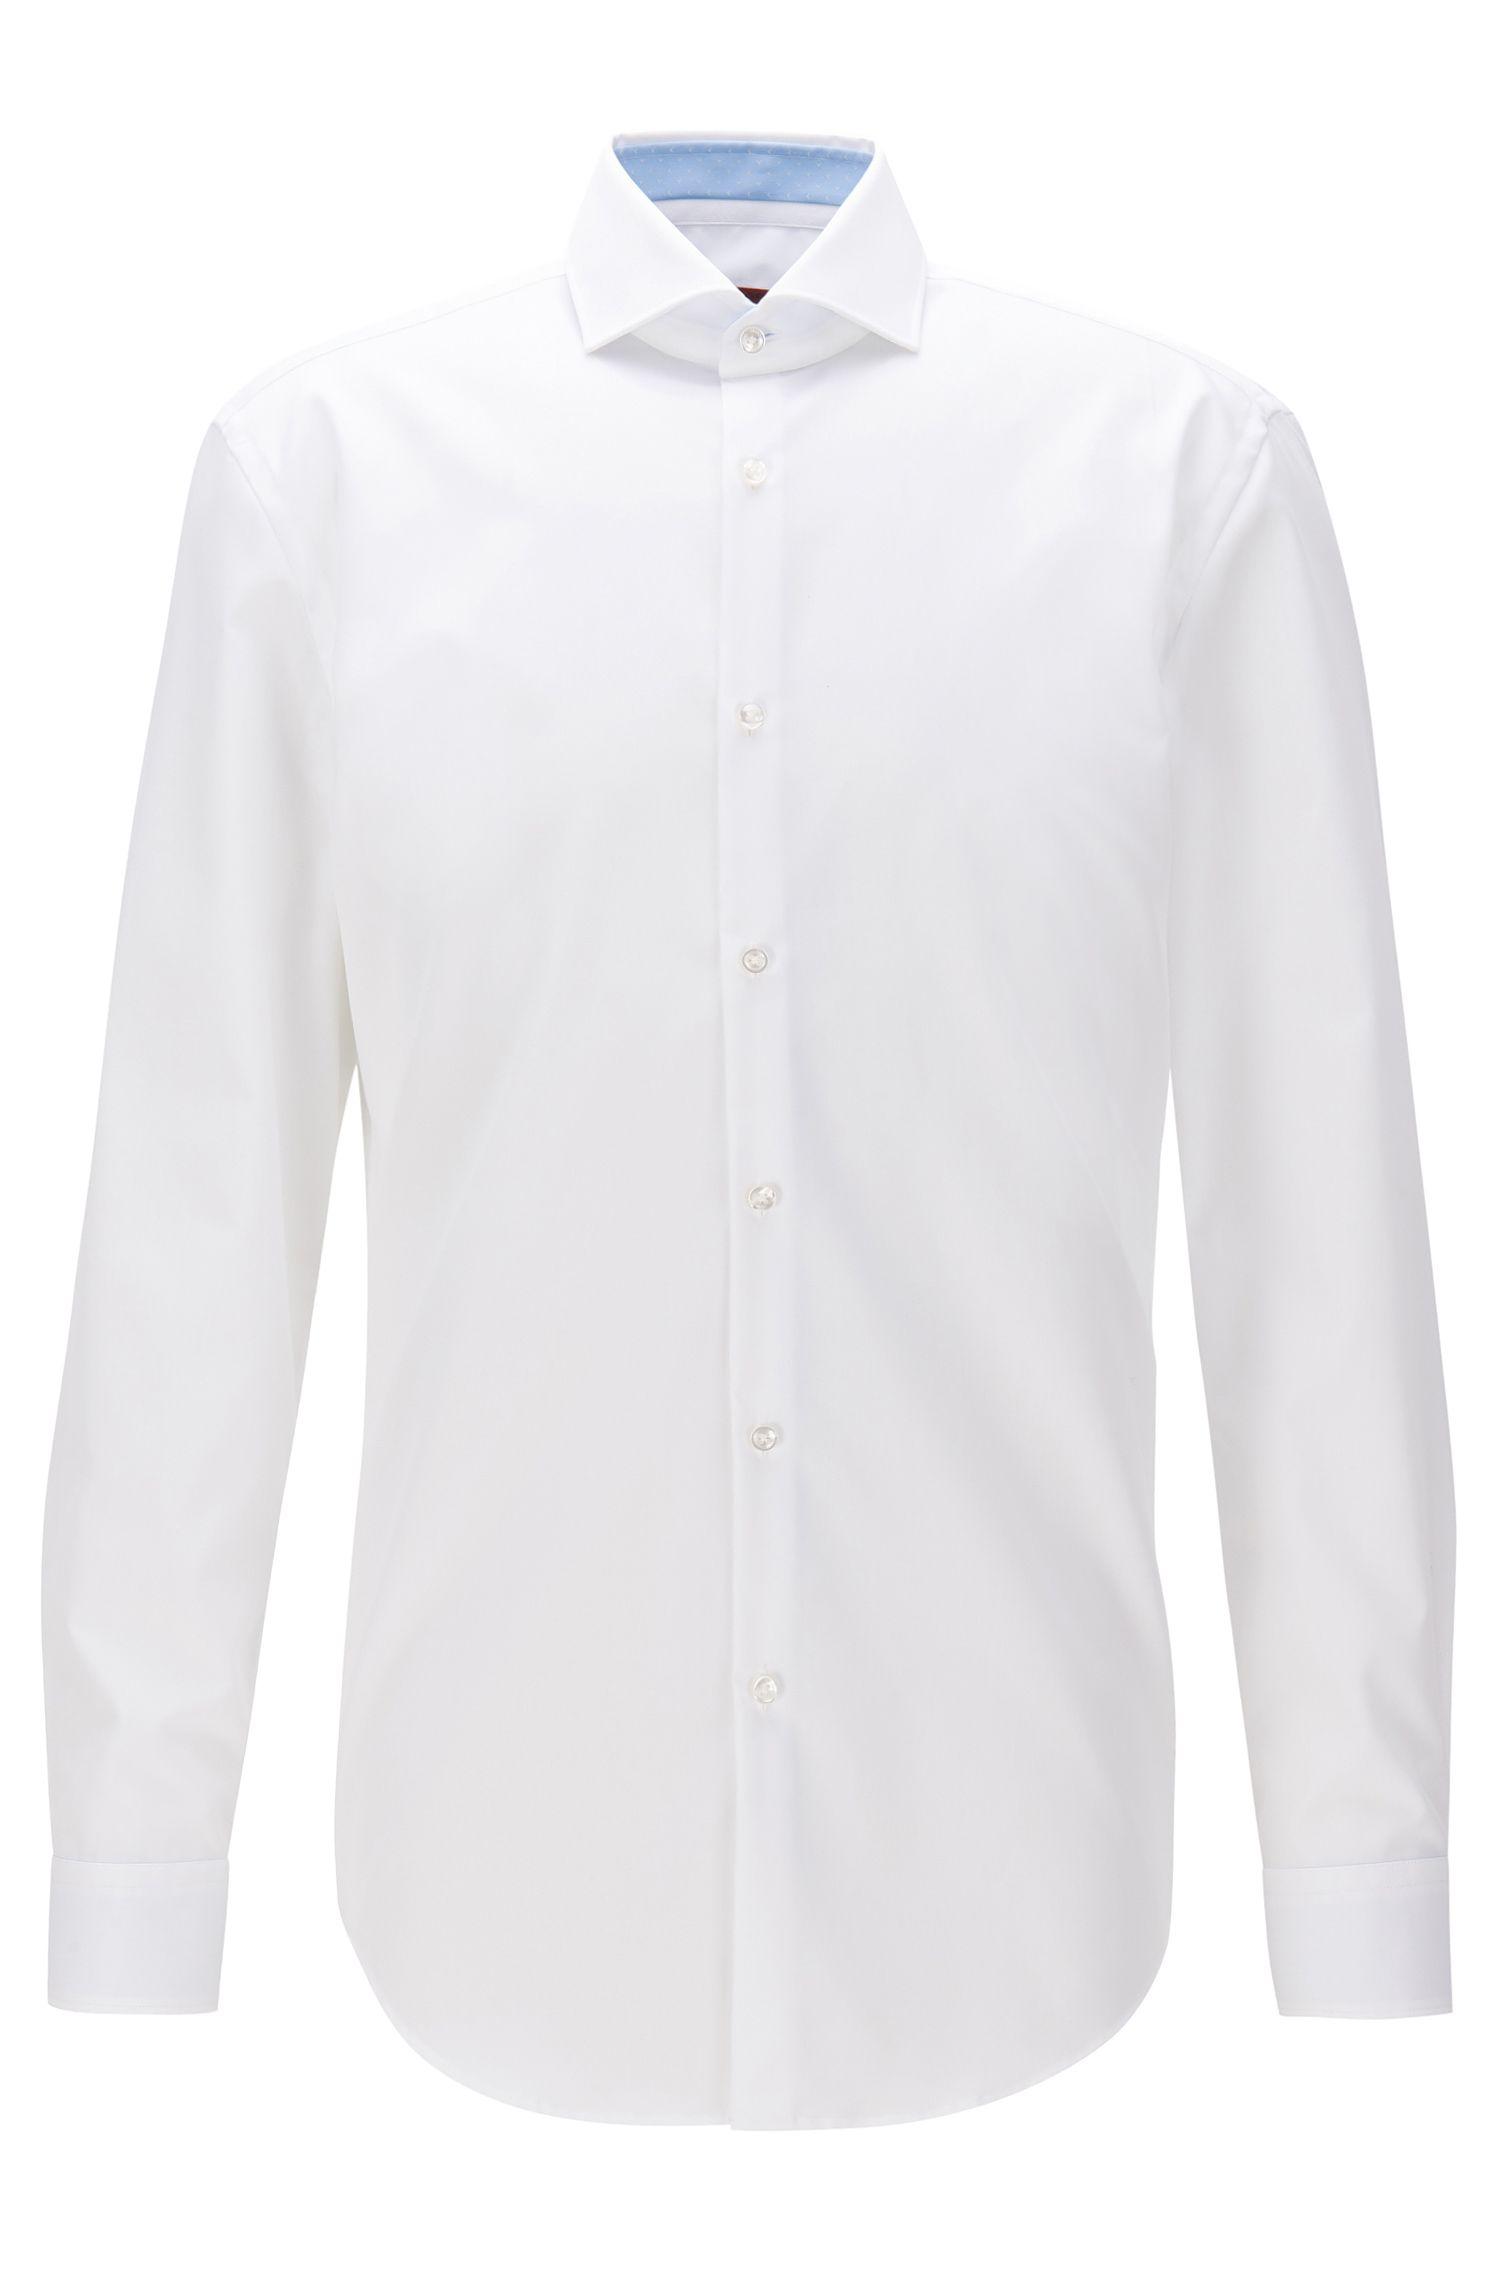 Slim-fit shirt in cotton poplin